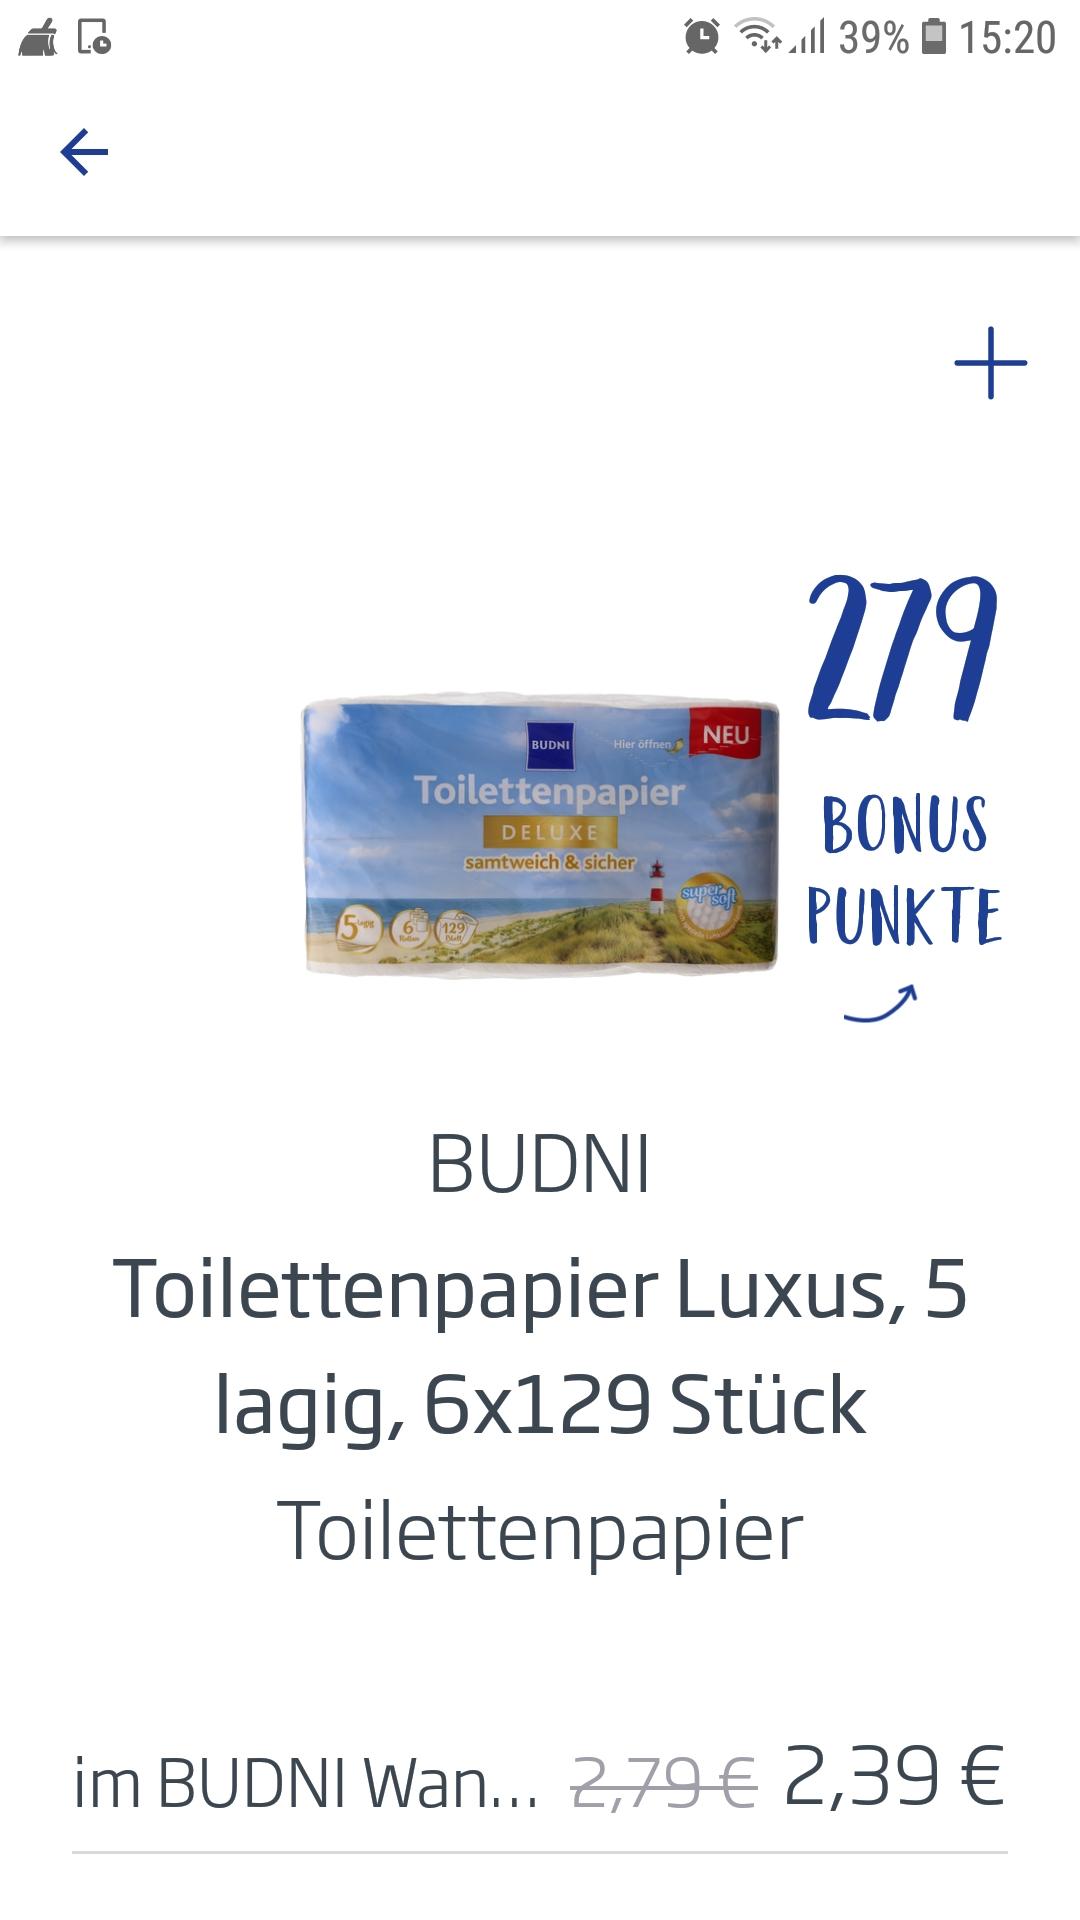 Budni Toilettenpapier Luxus, 5 lagig - 0,40 € in der Budni App